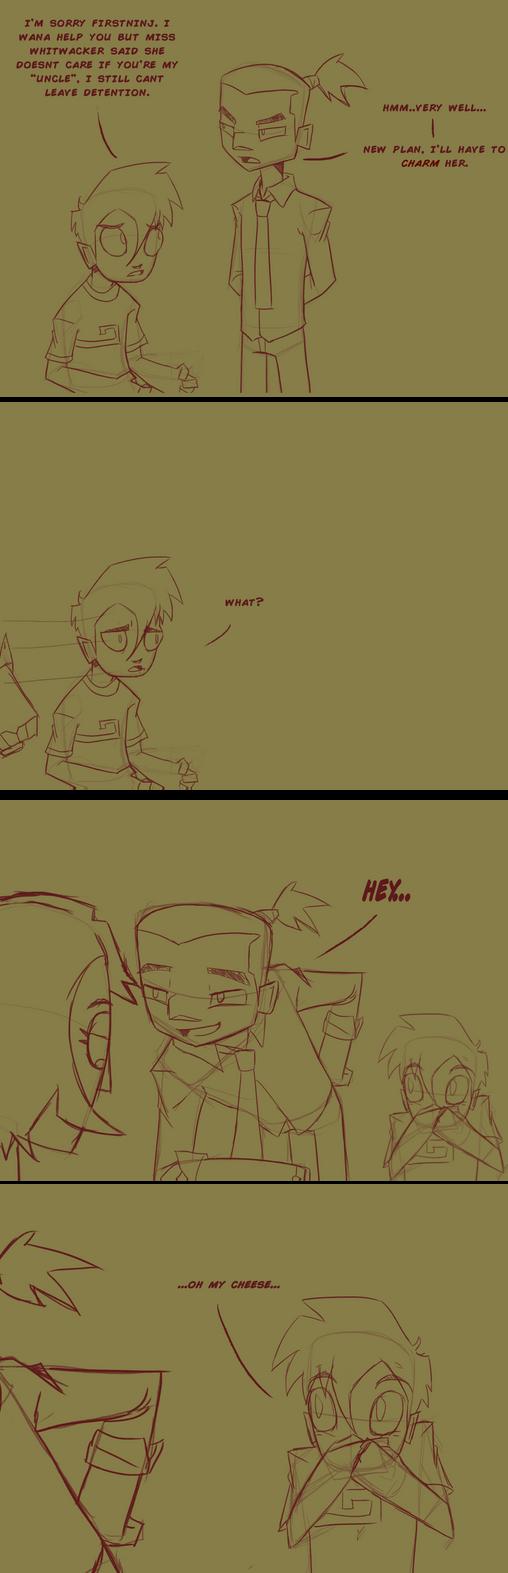 rc9gn comic by RisingDiablo